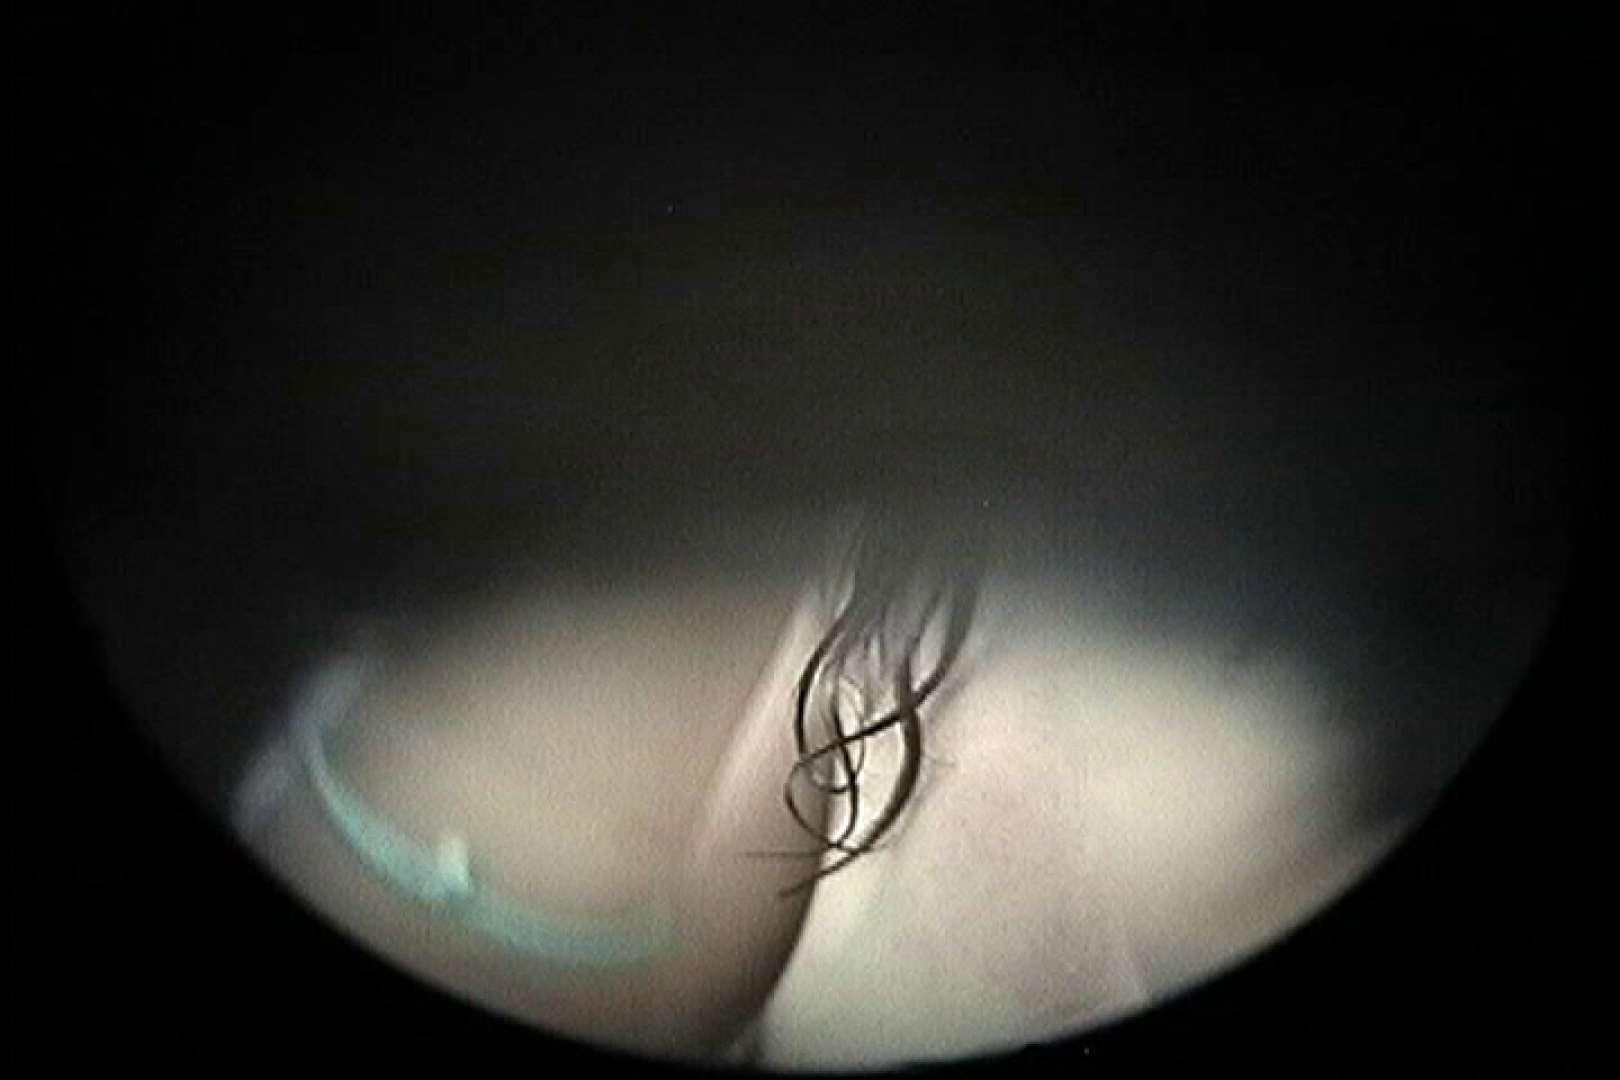 No.24 ビキニの割には陰毛は獰猛、ハミ毛が心配 0  104連発 42